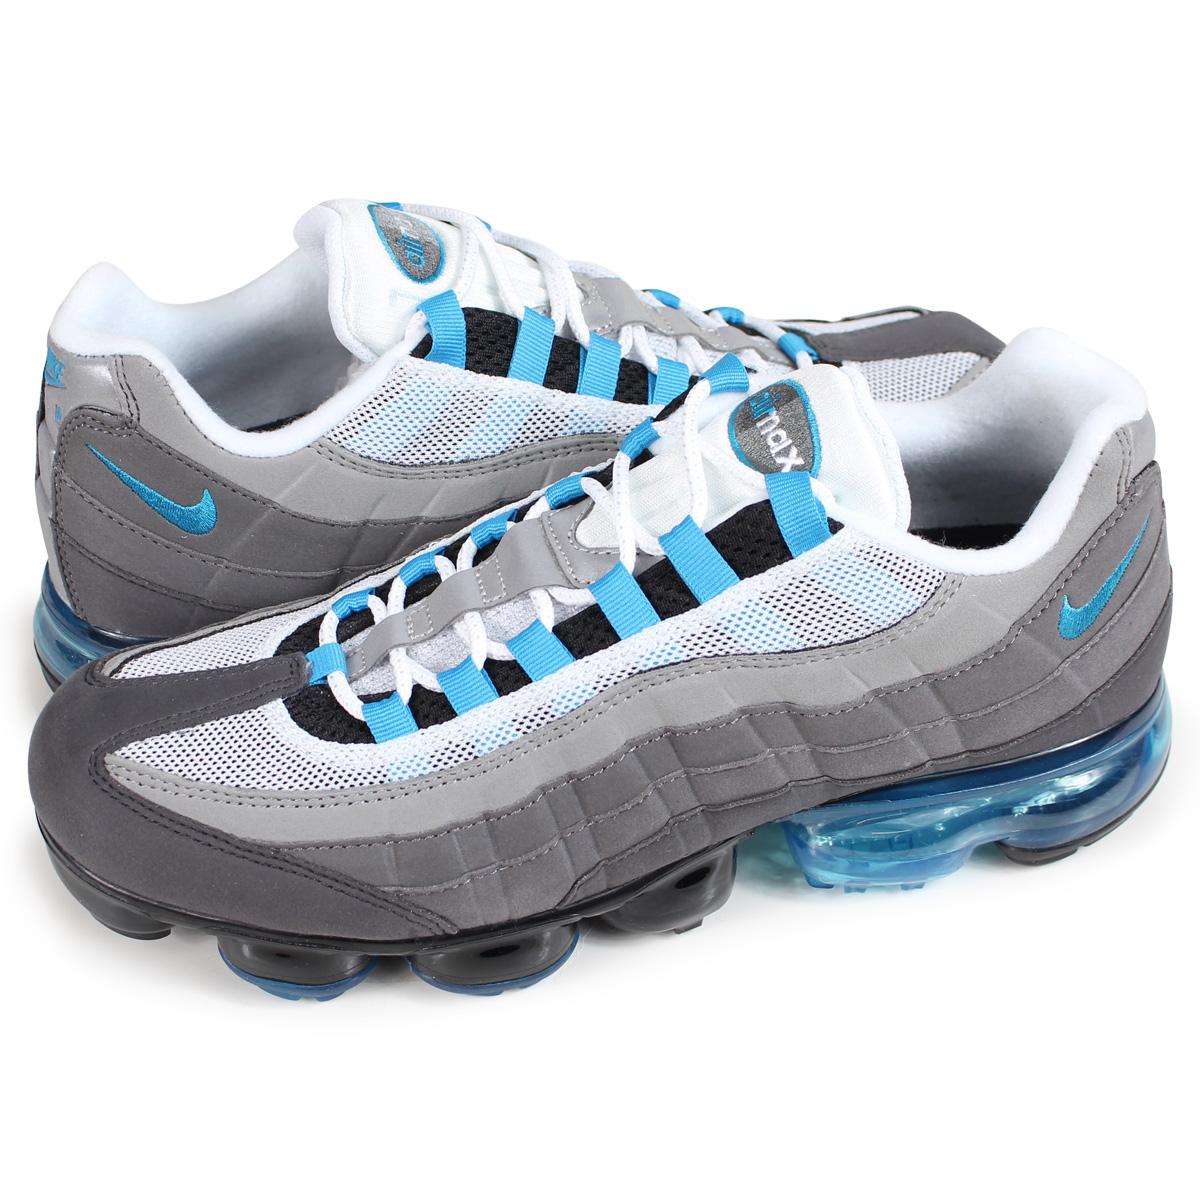 ec193bd64c3  brand NIKE getting high popularity from sneakers freak . AIR VAPORMAX 95  ...